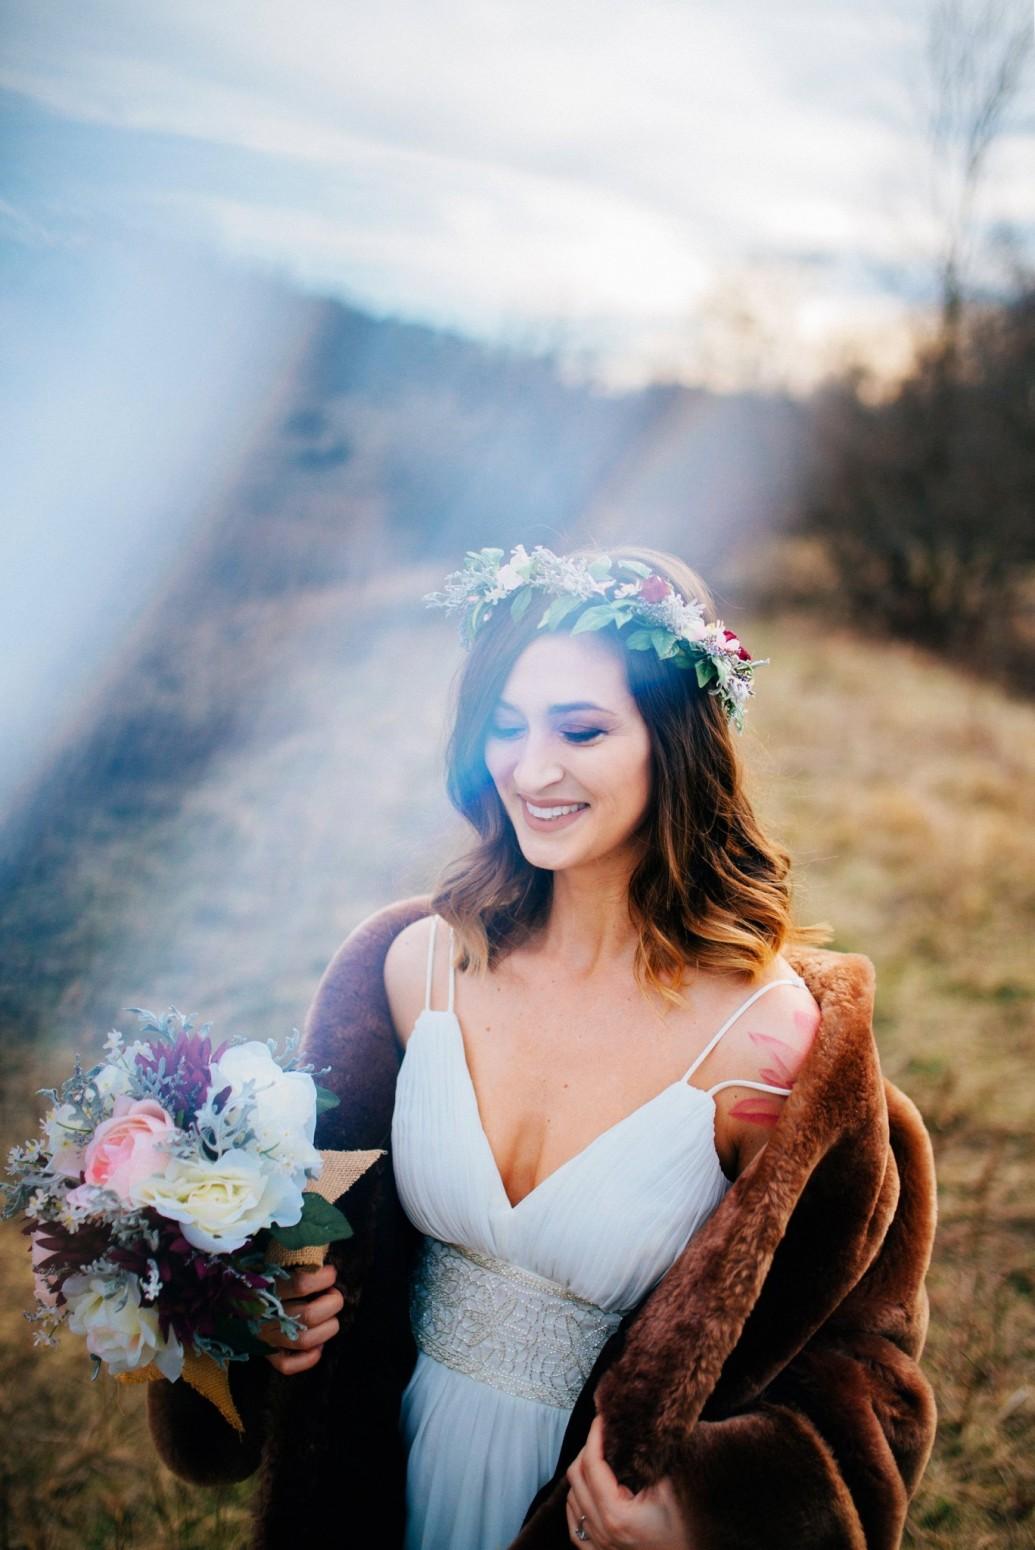 wild-native-photography-pittsburgh-wedding-photographer-styled-shoot-bridal_1943